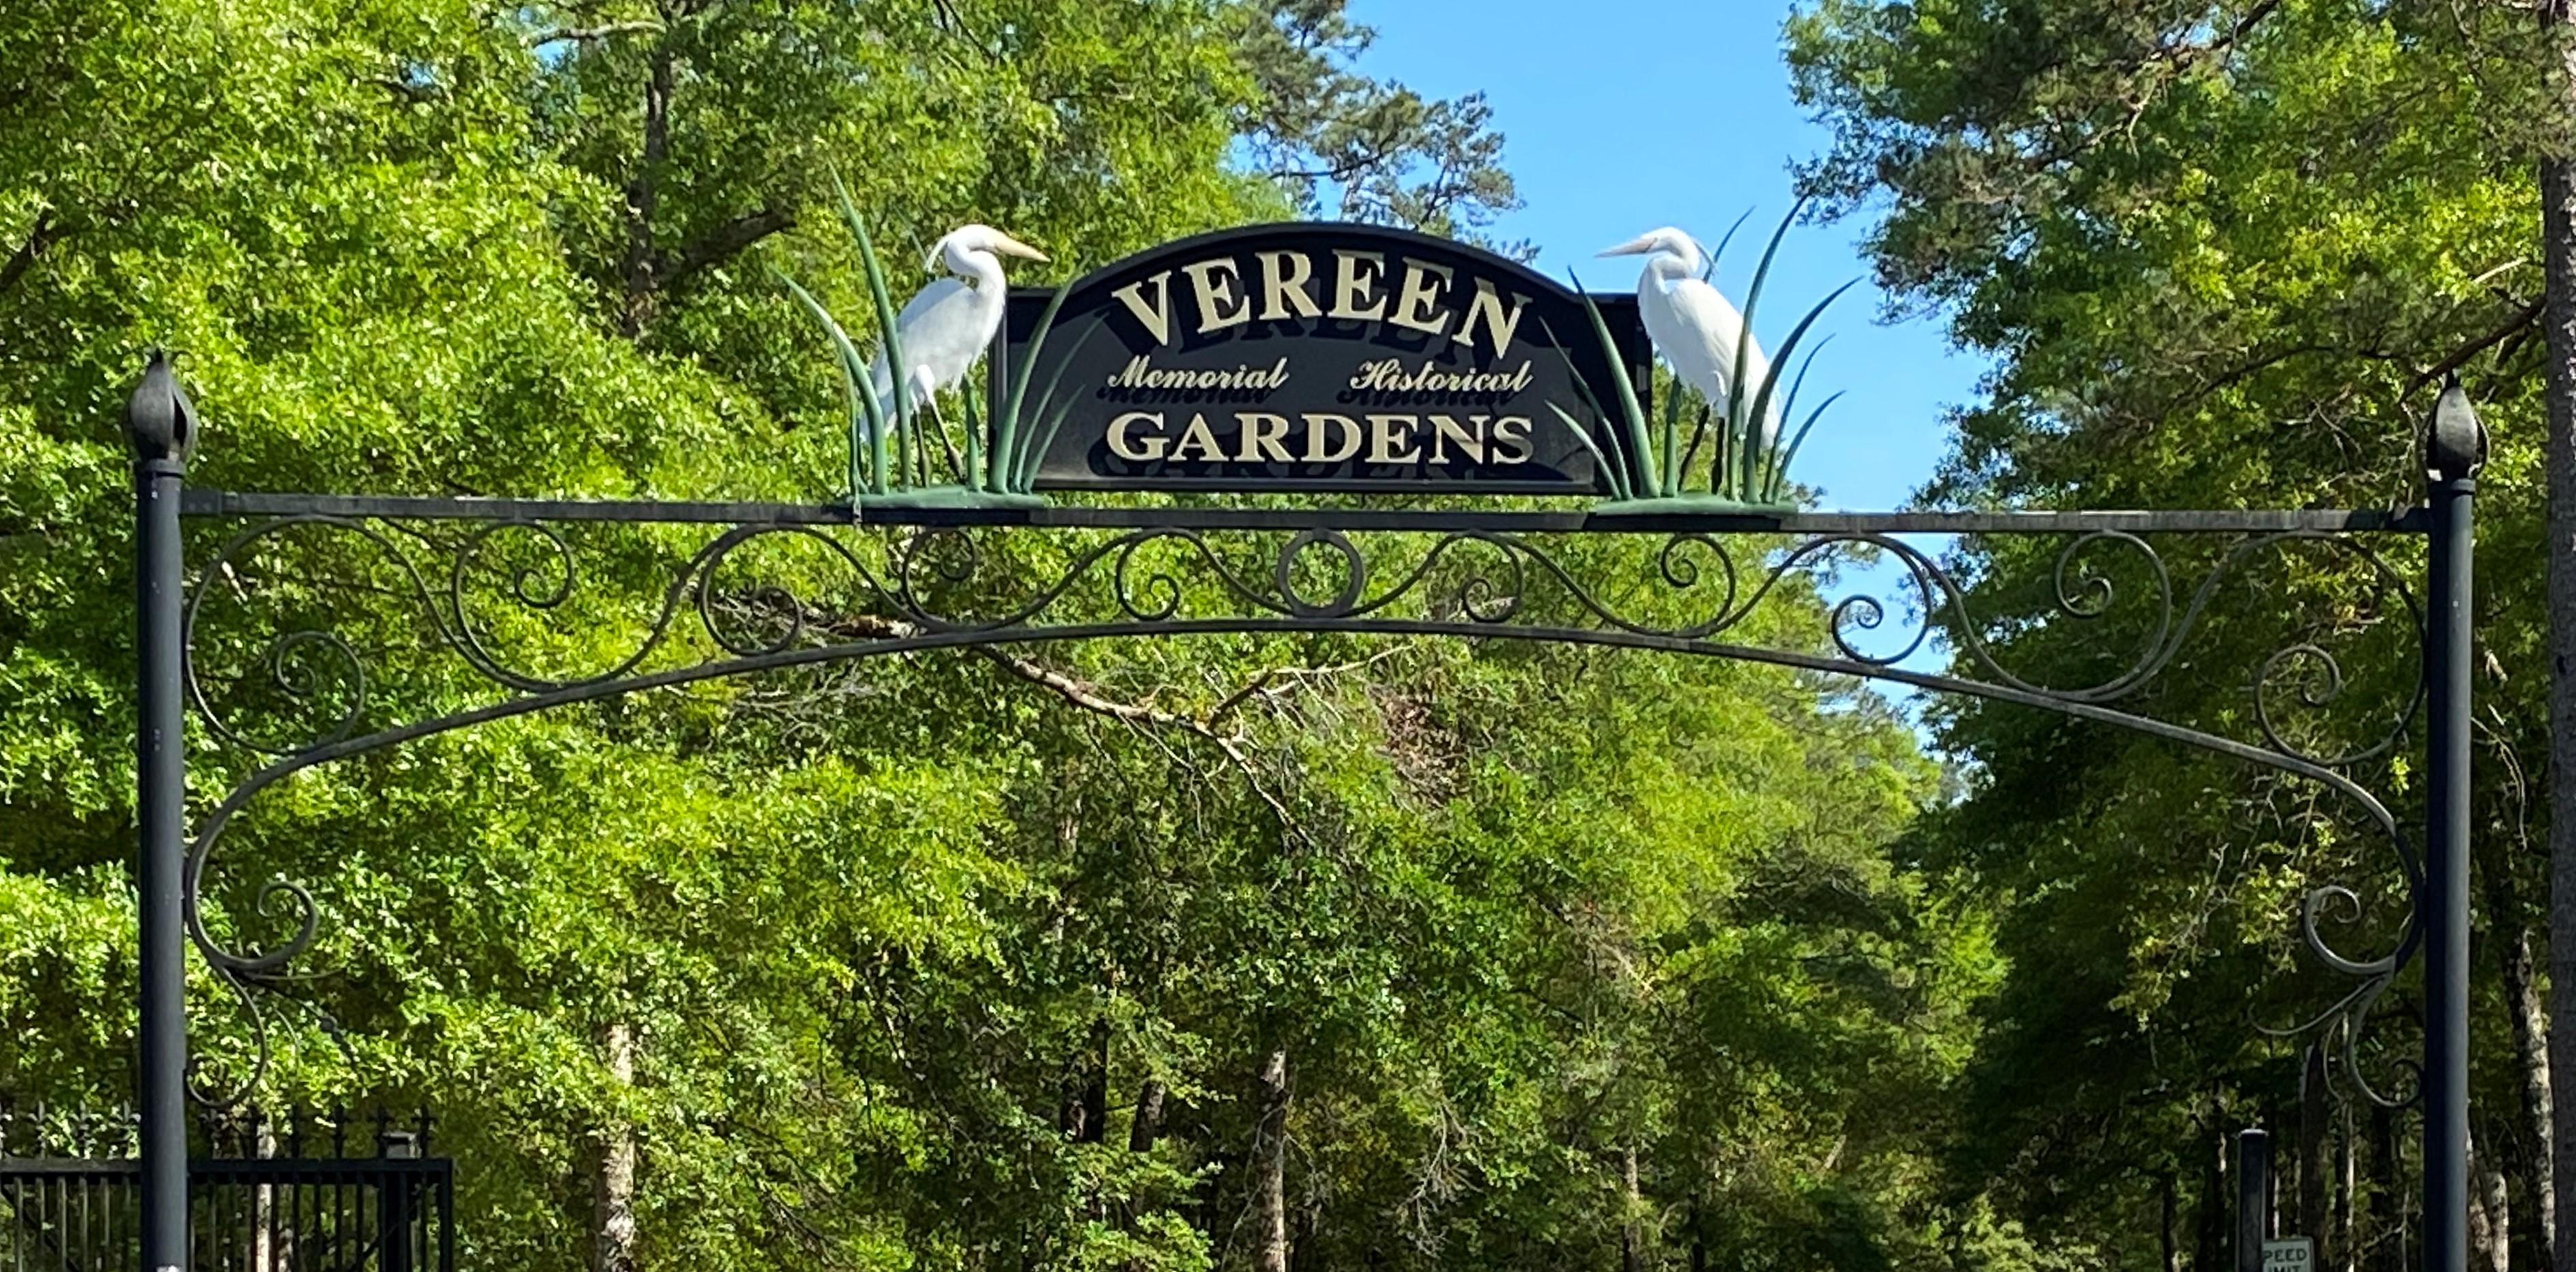 Vereen Gardens